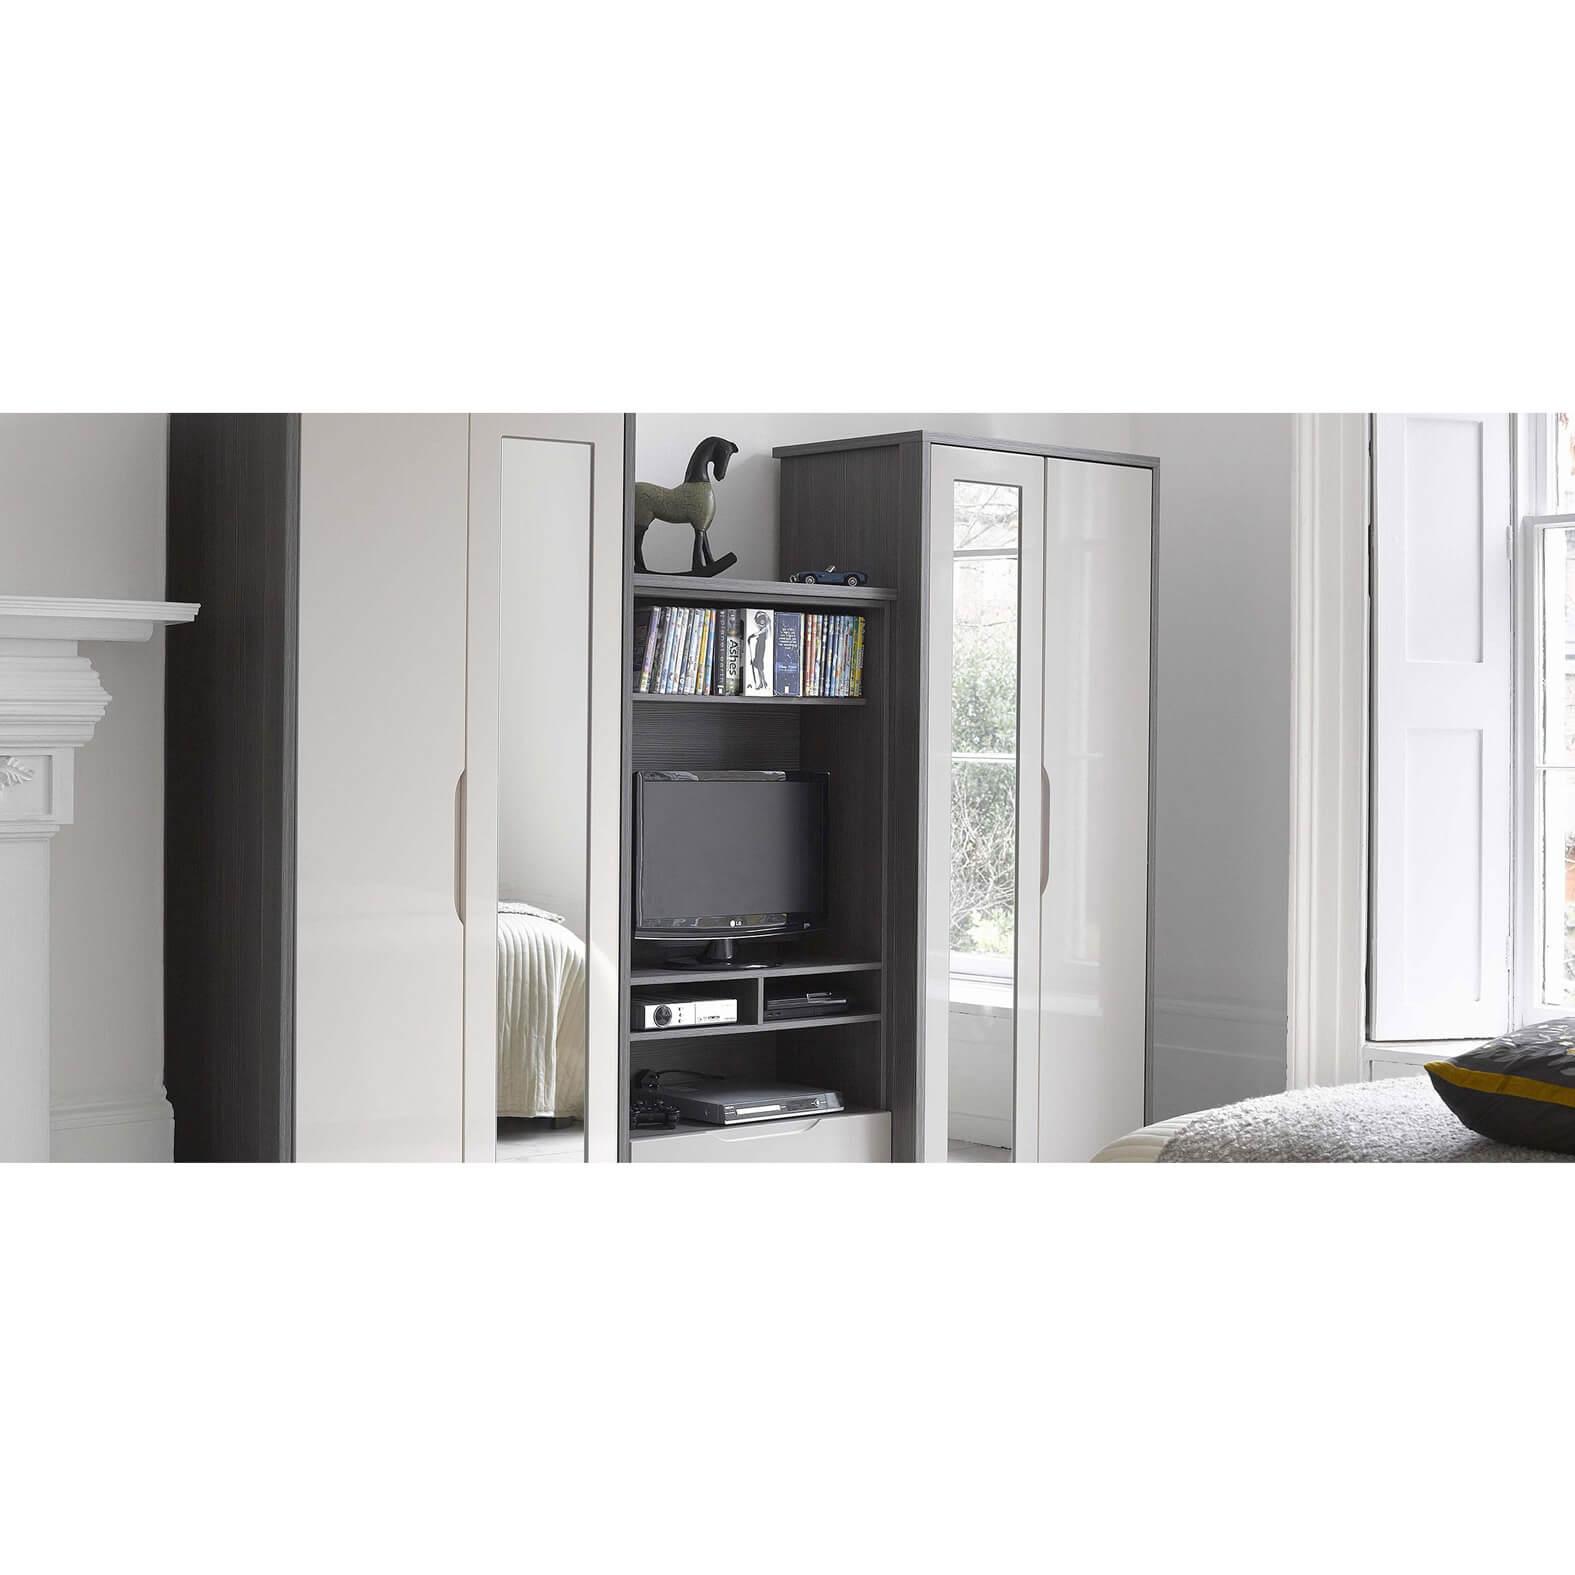 1cfl-april-premium-plus-grey-avola-sand-room-setting-2100x1000